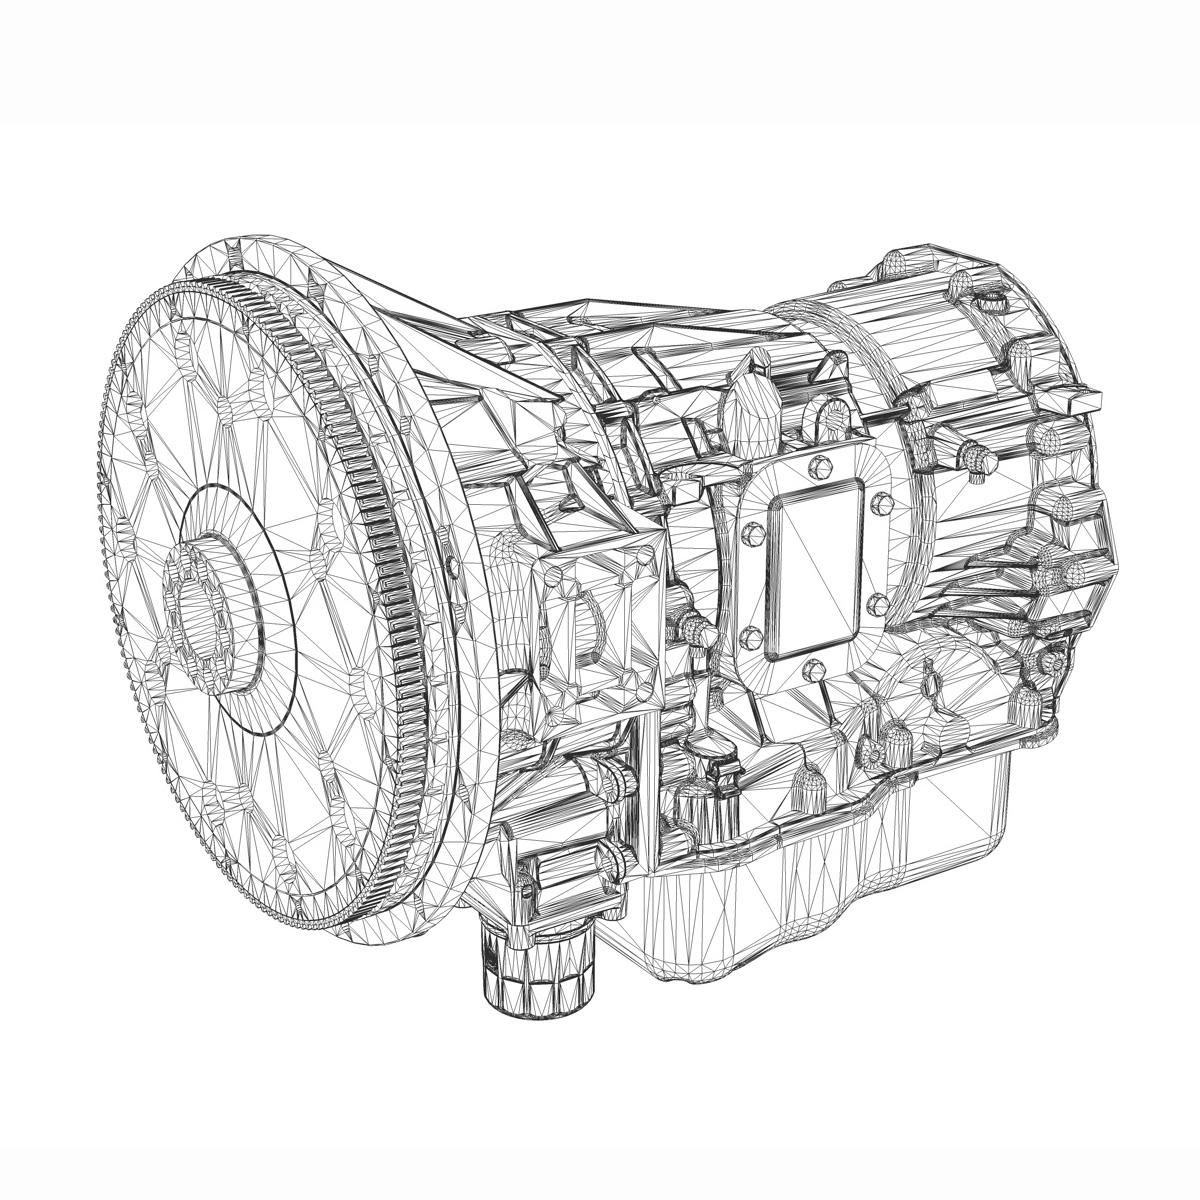 gearing – transmission 3d model 3ds fbx c4d lwo obj 189236